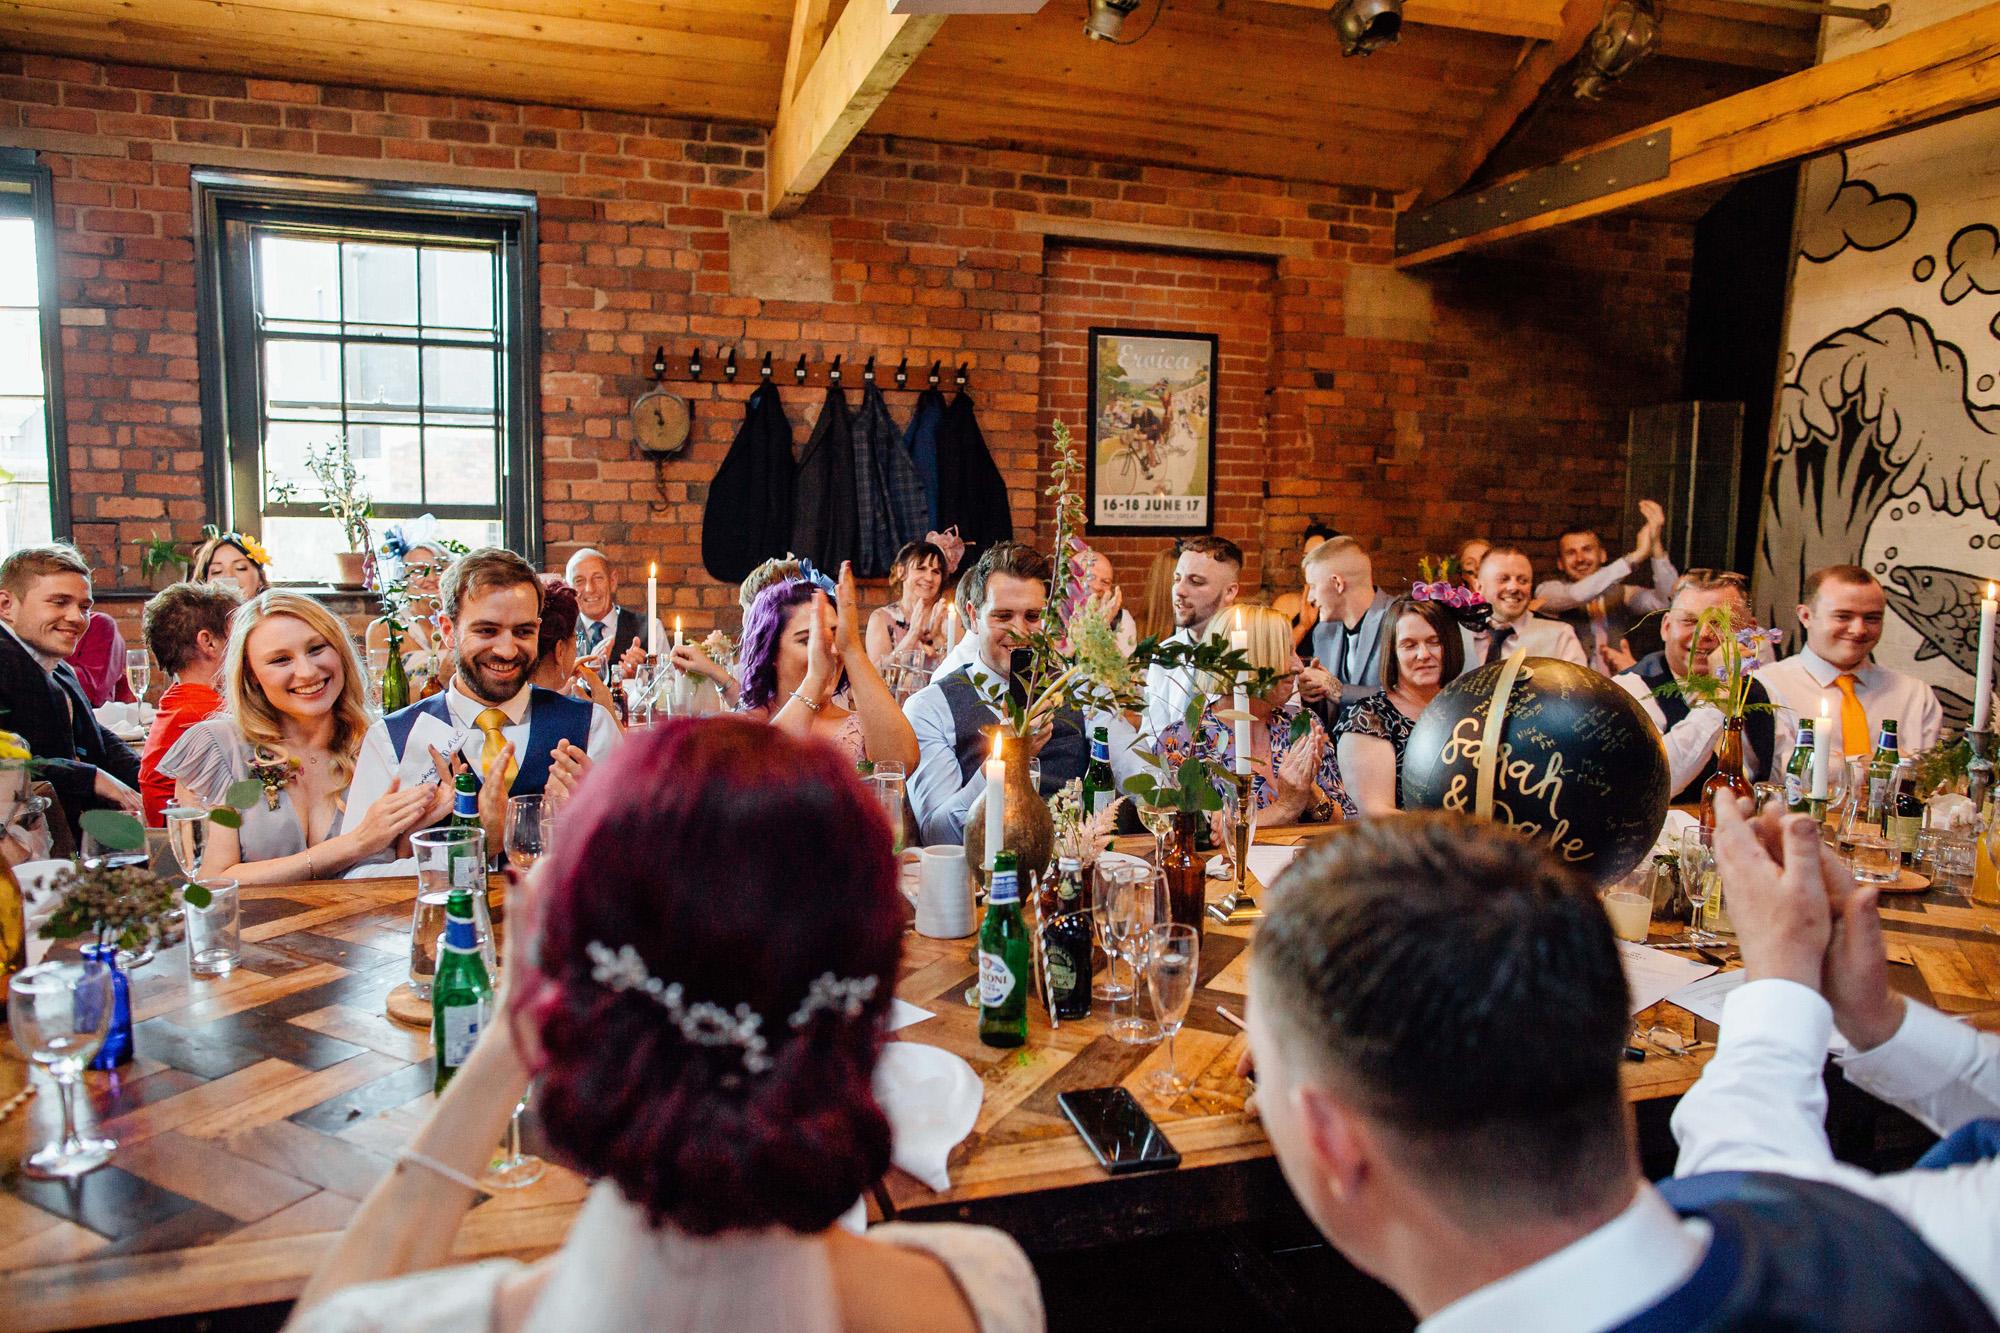 Sarah-Honeysuckle-Bias-Cut-Silk-Vintage-Inspired-Wedding-Gown-Sheffield-Wedding-Kate-Beaumont-49.jpg